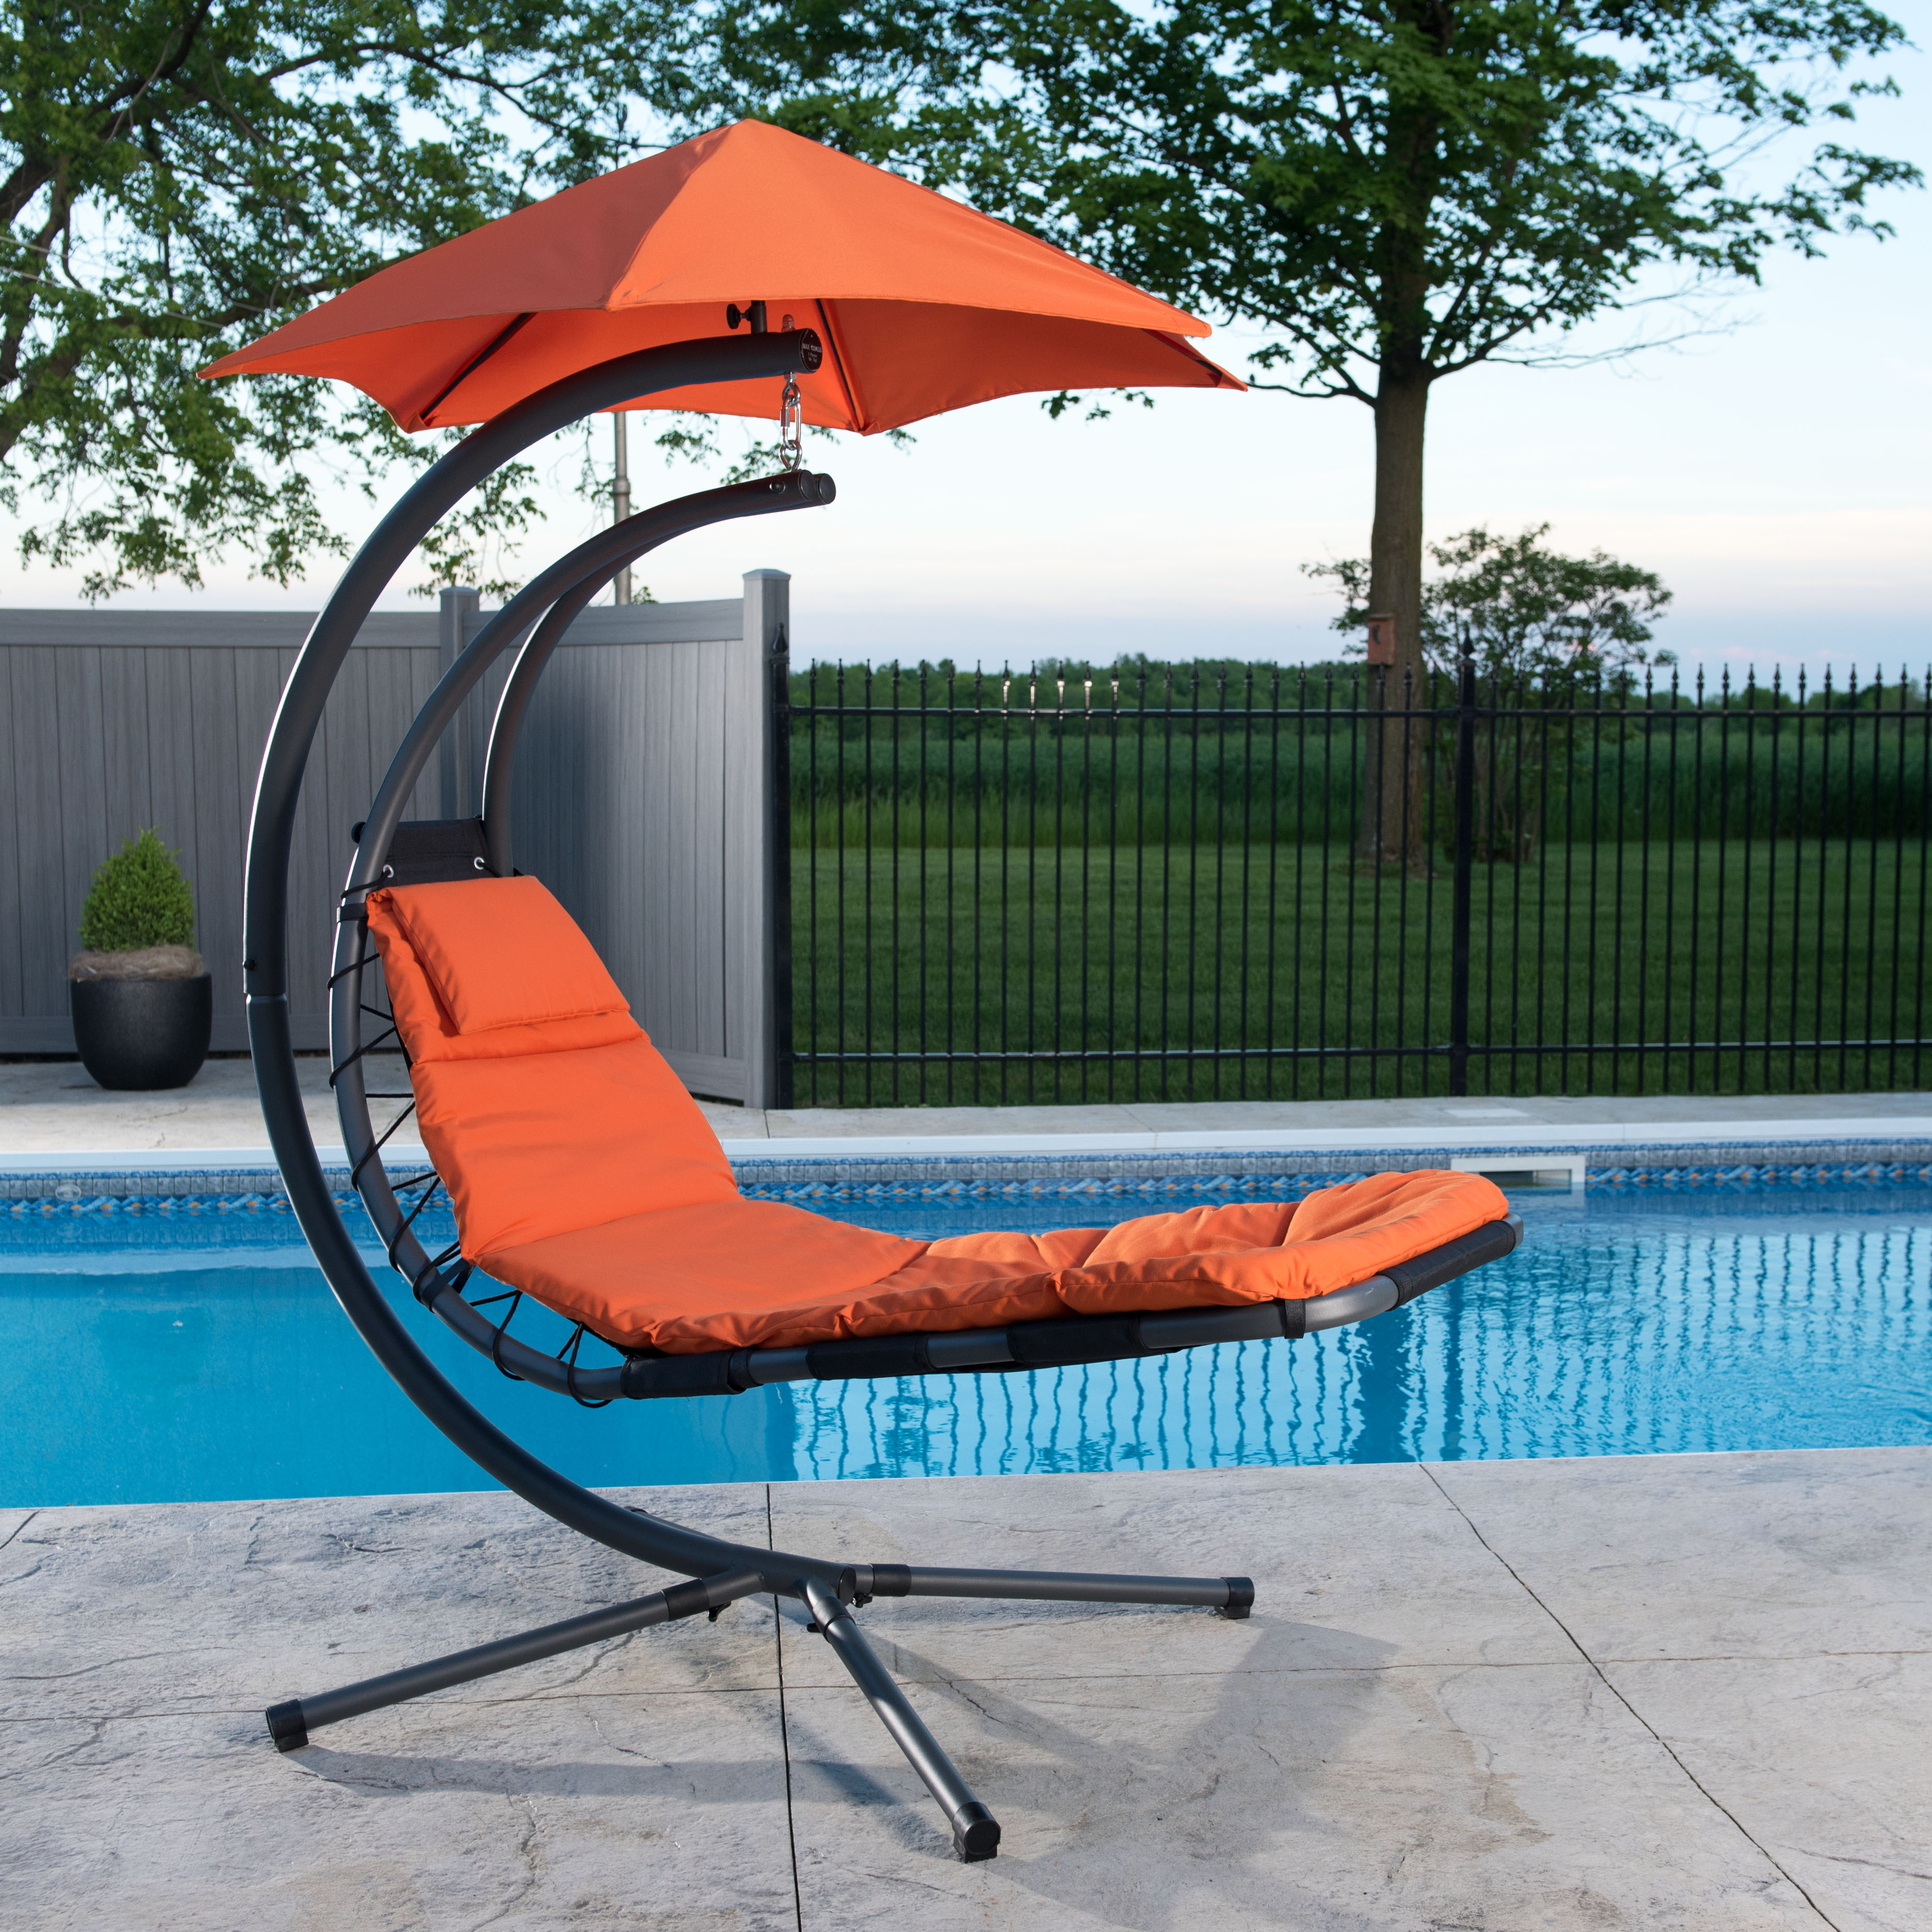 The Original Dream Chair, Orange Zest